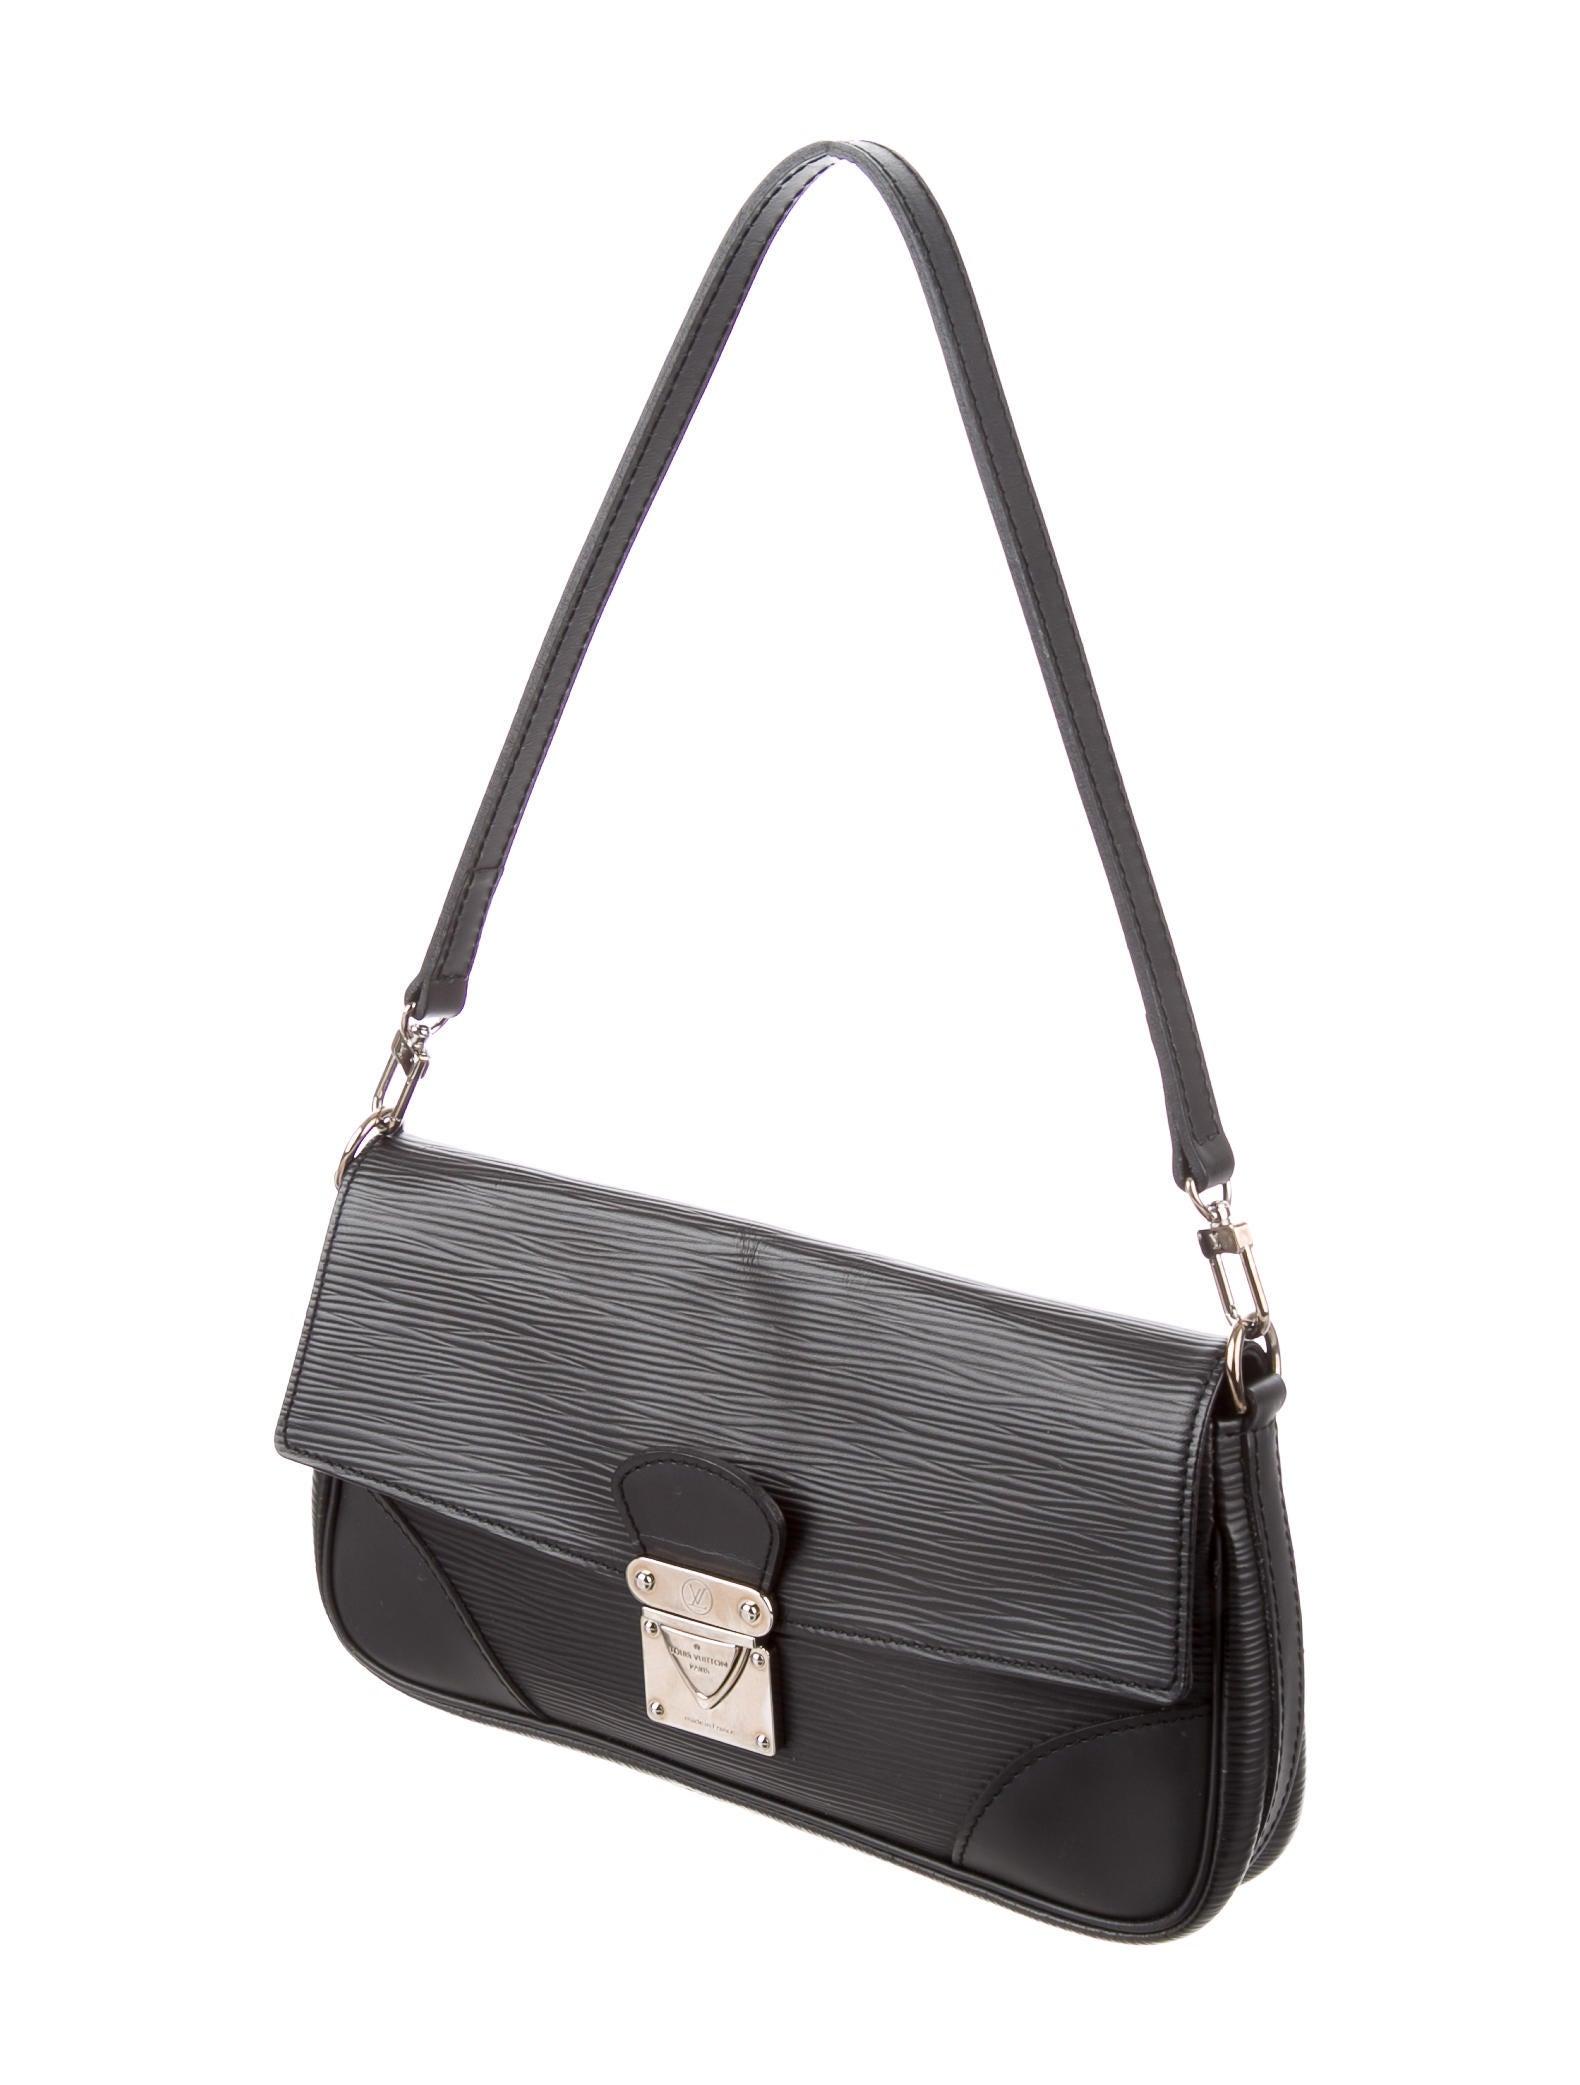 louis vuitton epi segur pochette handbags lou134185. Black Bedroom Furniture Sets. Home Design Ideas